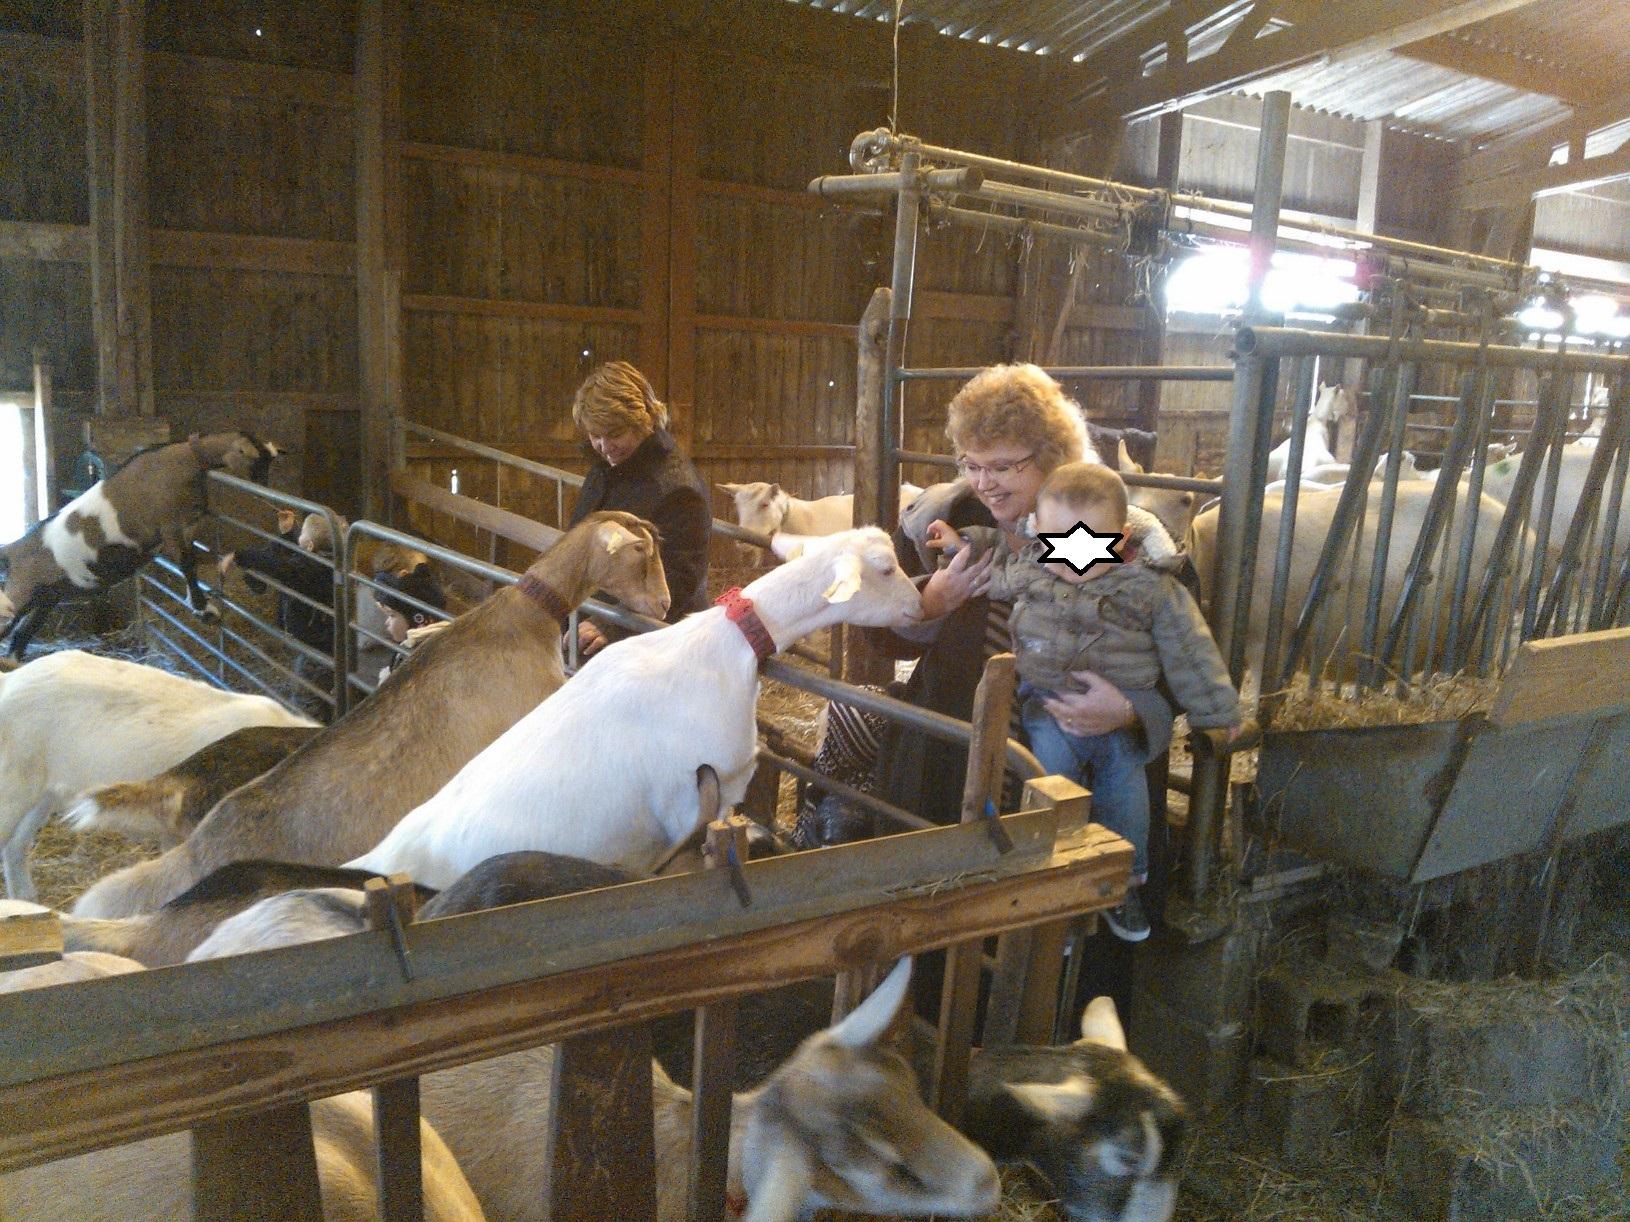 2012 visite la ch vrerie de rambouillet aamcr for Visite de rambouillet